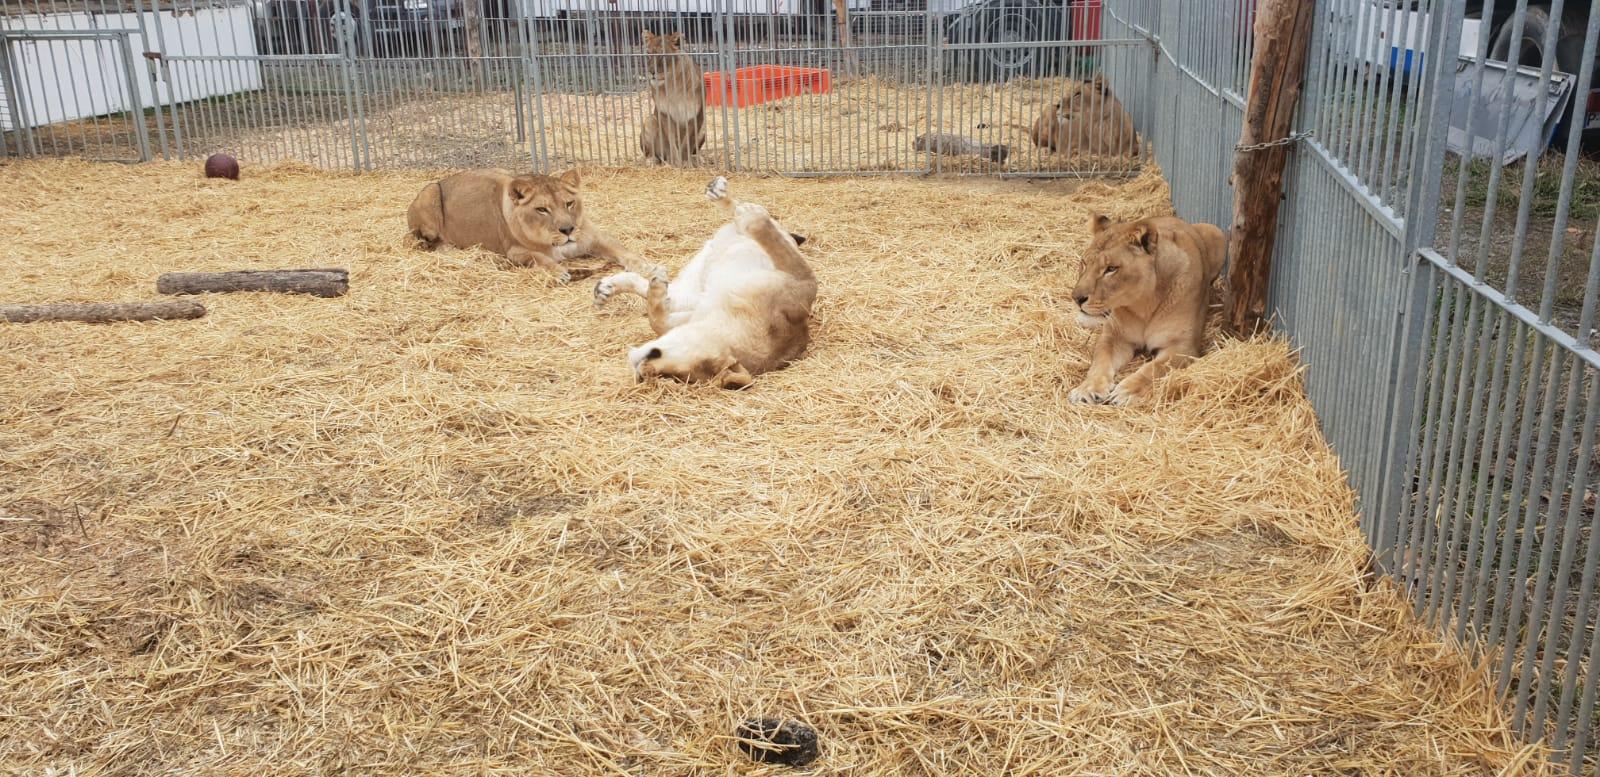 Tigres del Circo Quirós. (Foto cedida)